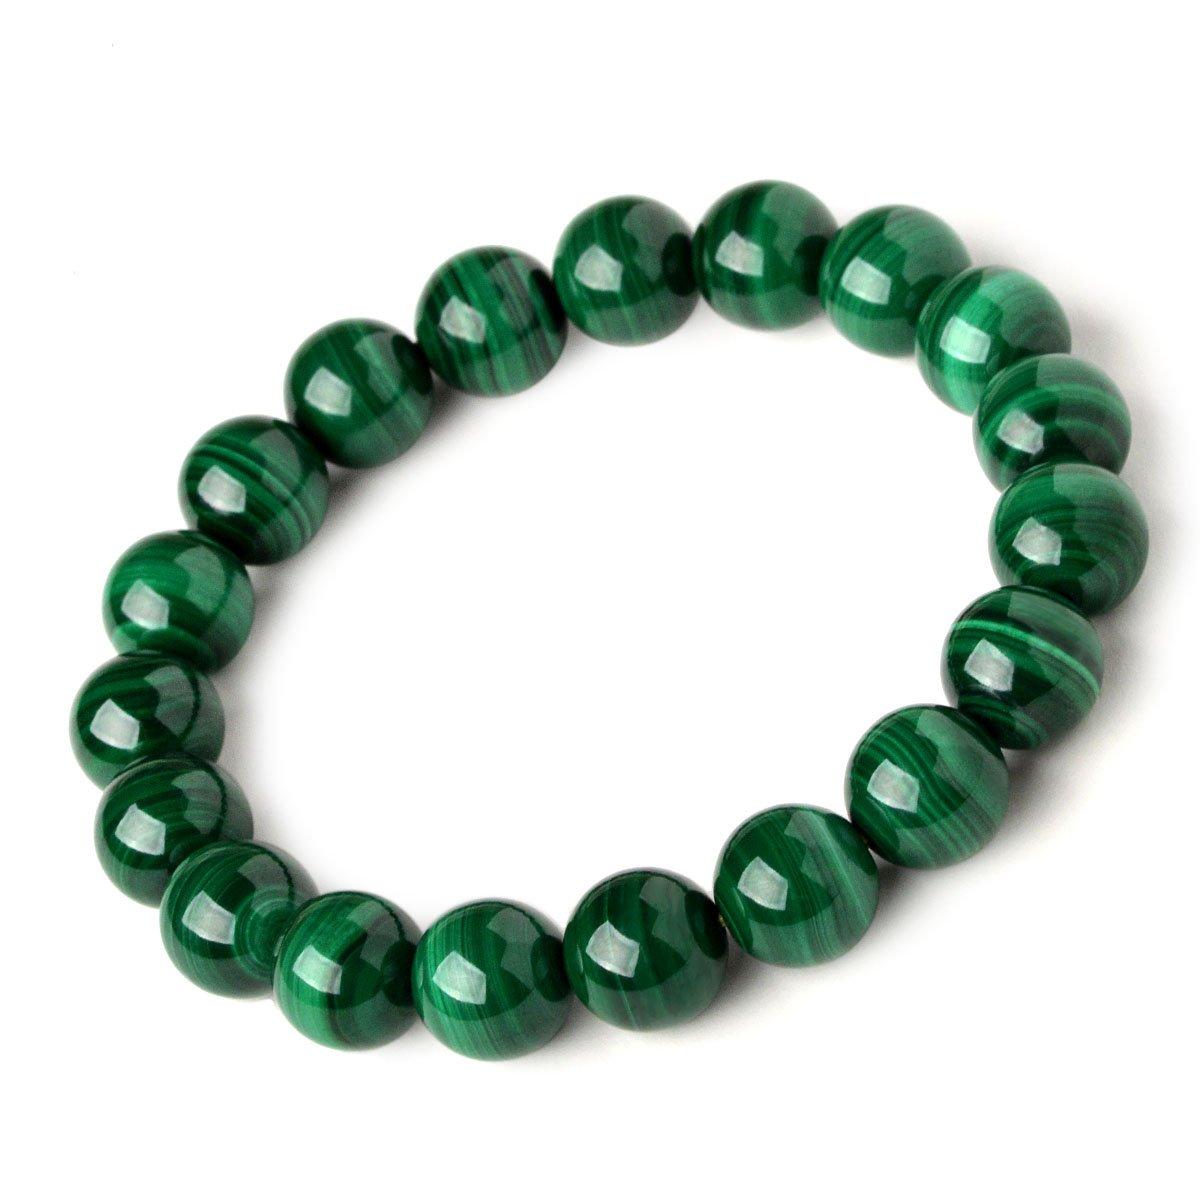 Osye Precious Gemstone Malachite Green Crystal Beaded Stretch Bracelet (14mm)